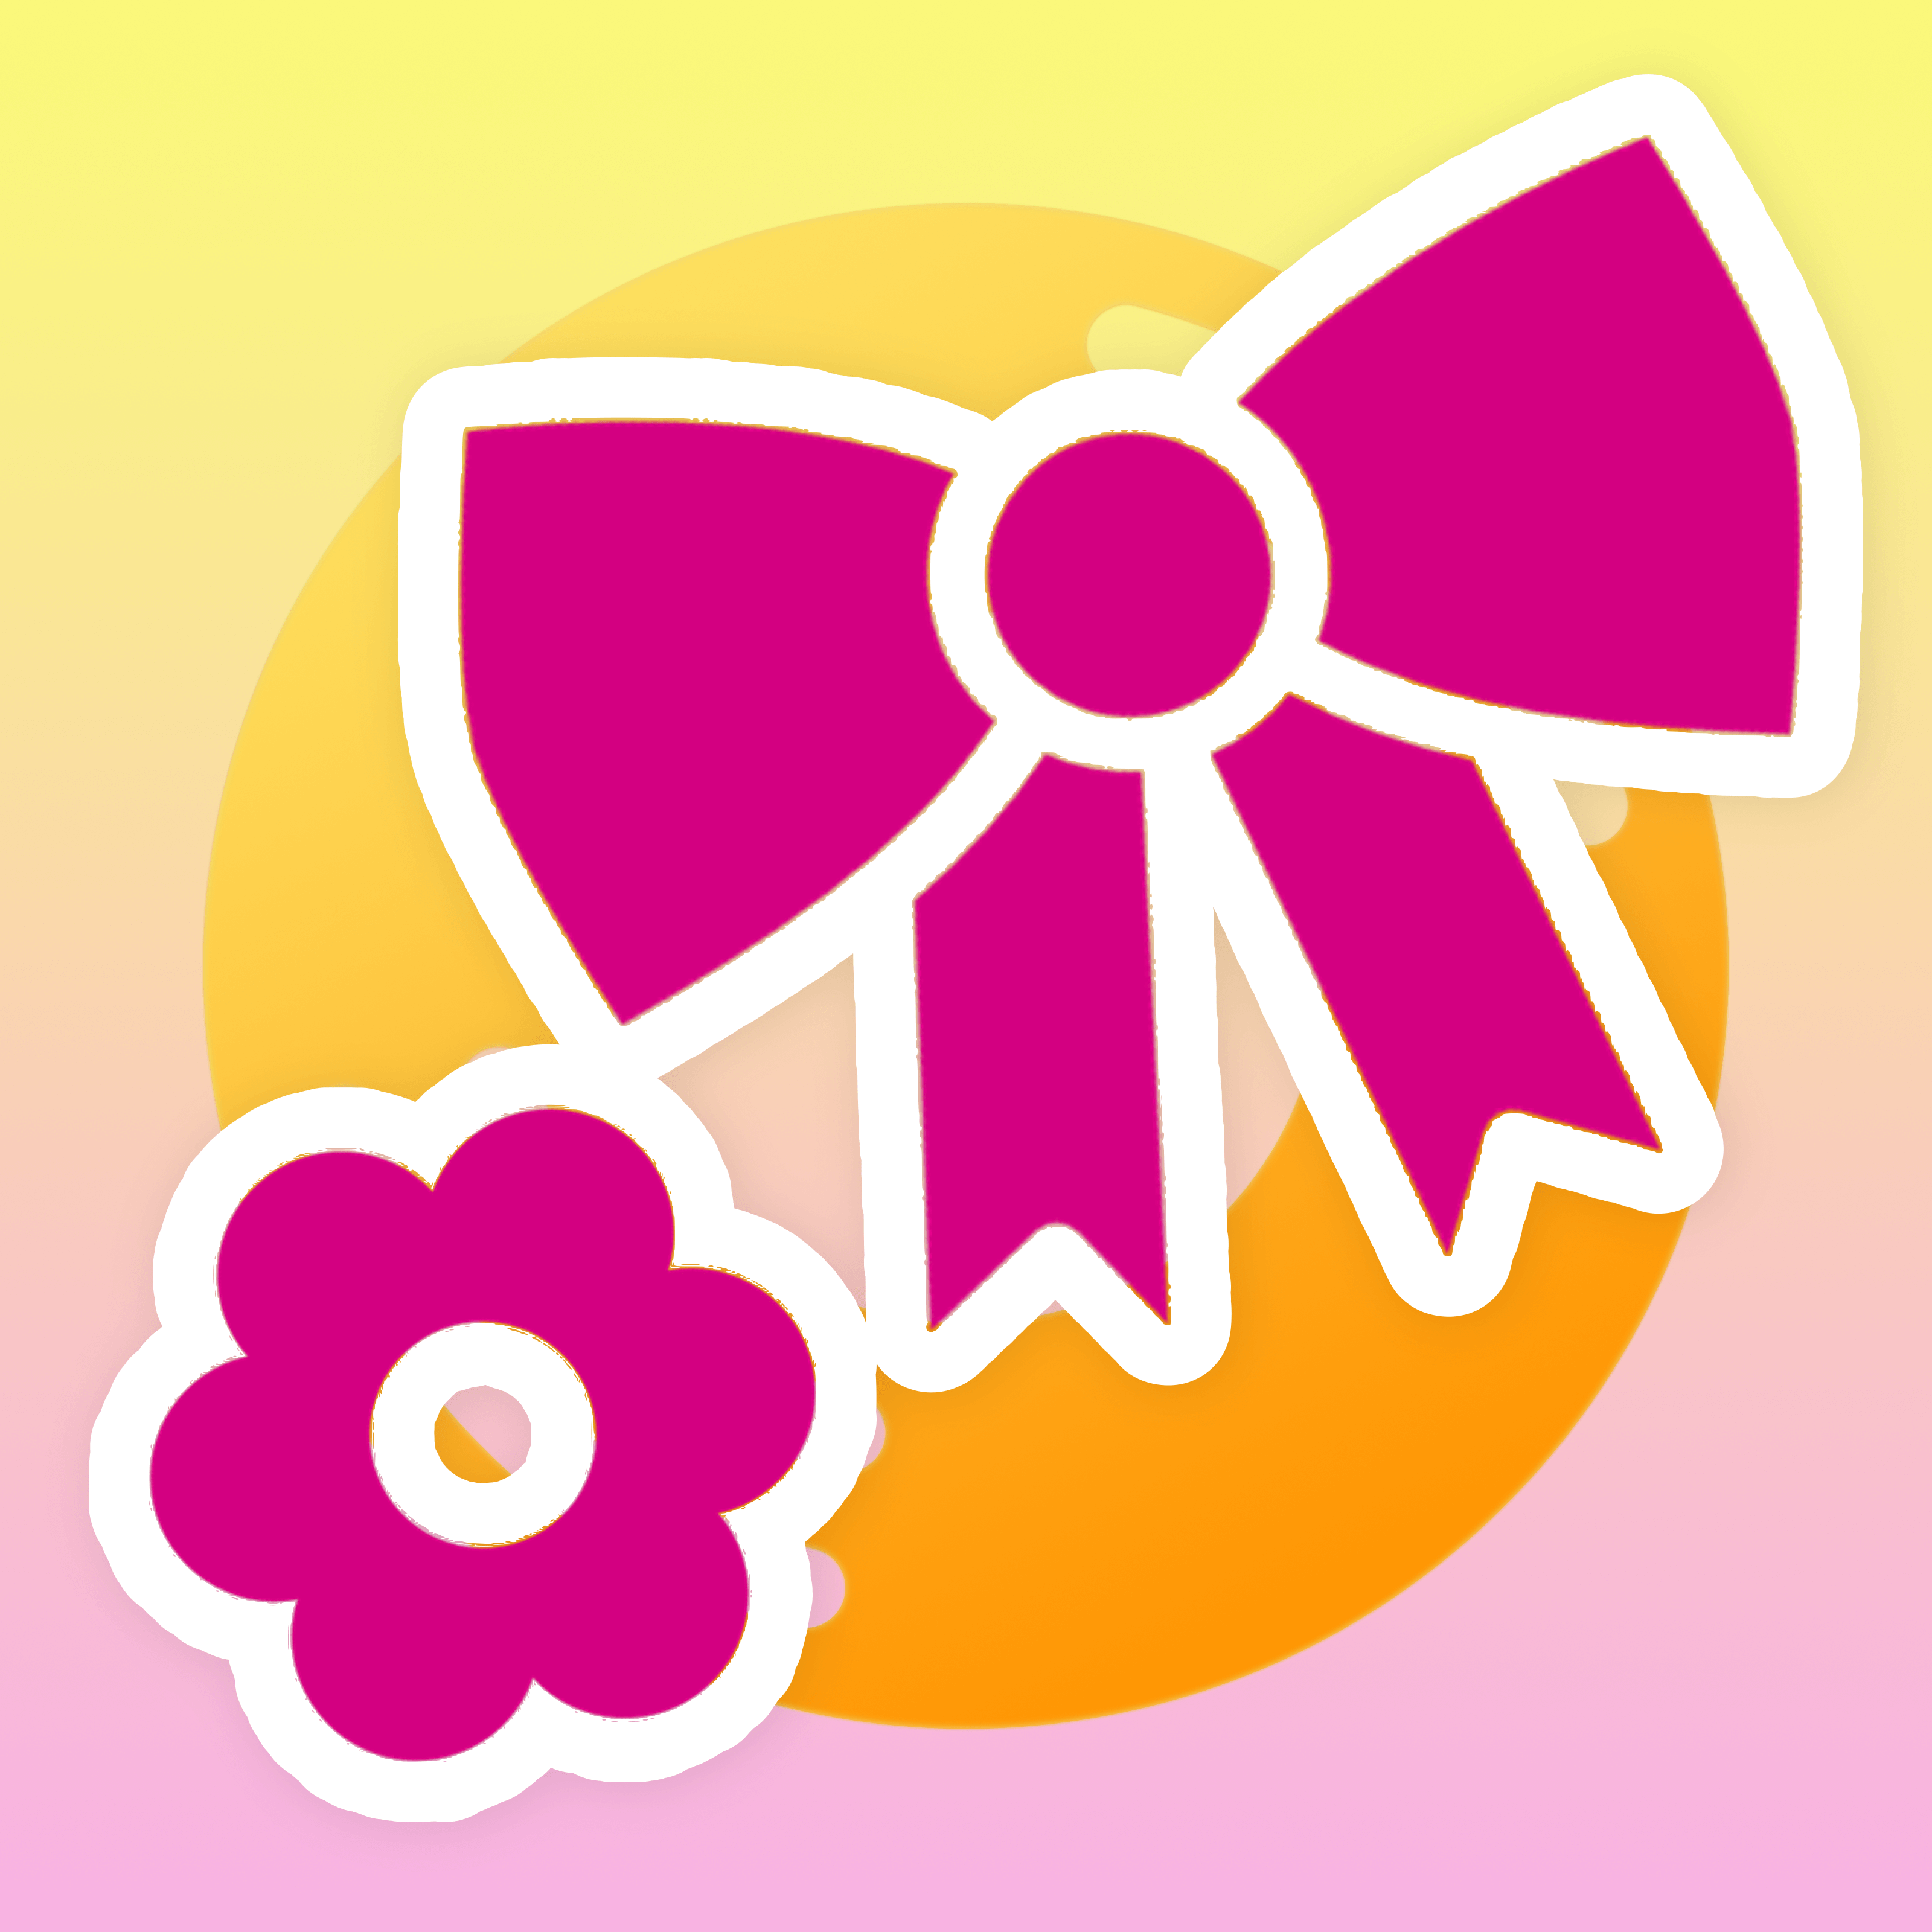 Fiesta_0309 avatar